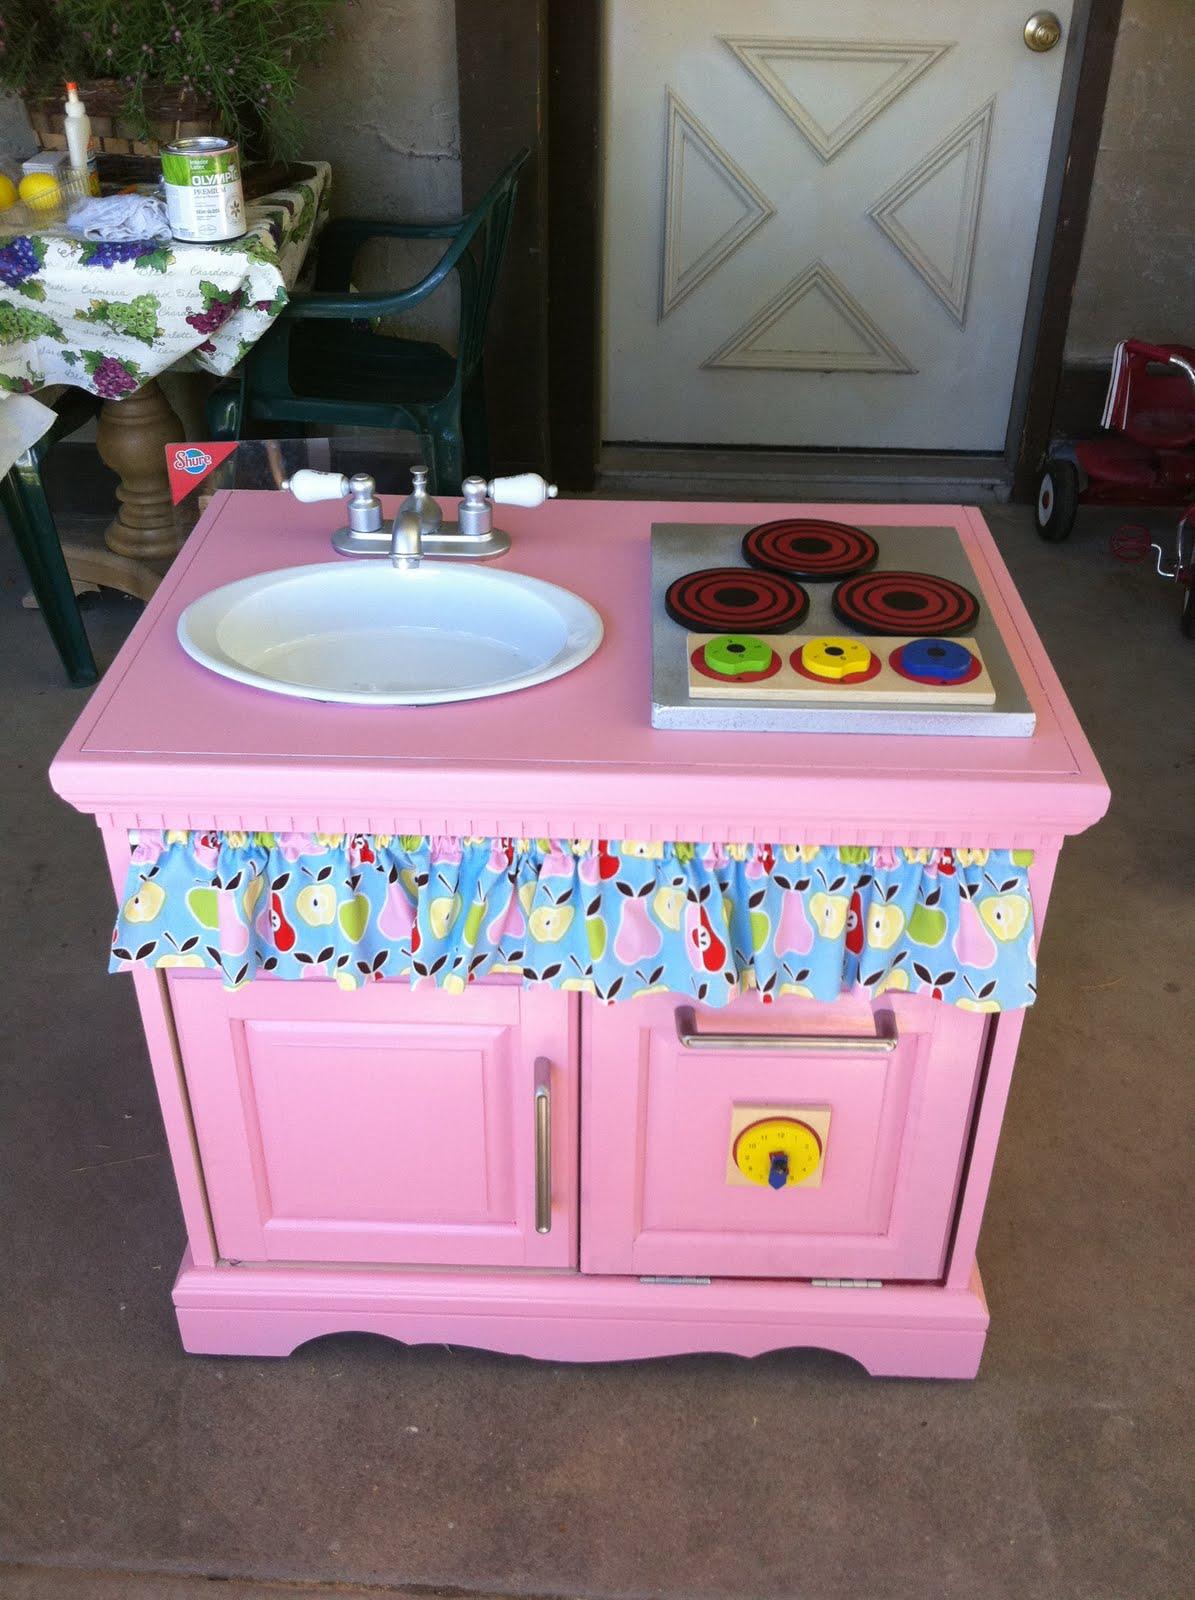 Homemade Play Kitchen Jon And Dolly Benson Homemade Christmas The Play Kitchen